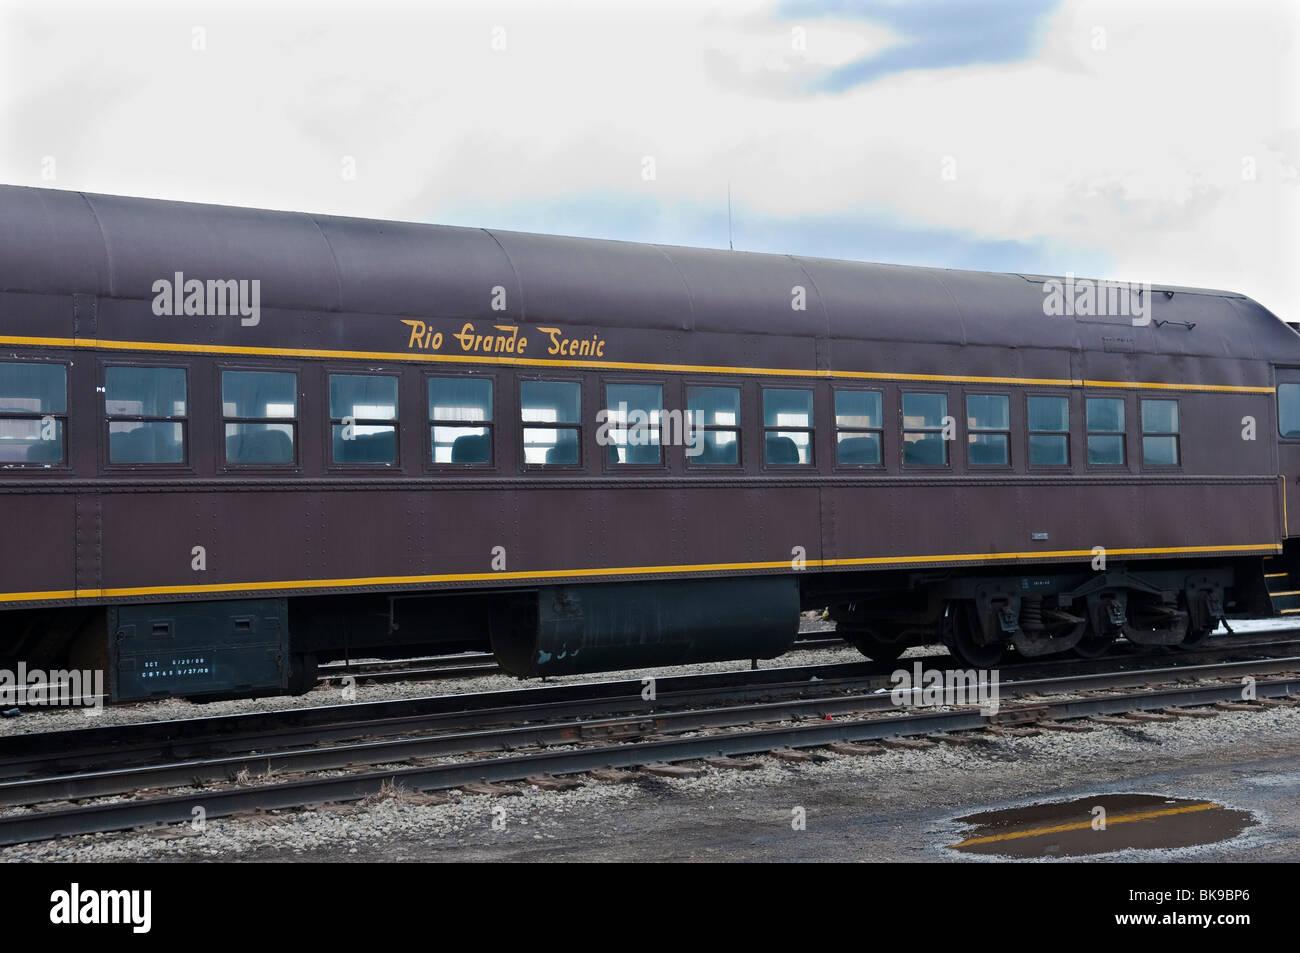 Old Denver Rio-Grande-Western Scenic railroad passenger car - Stock Image